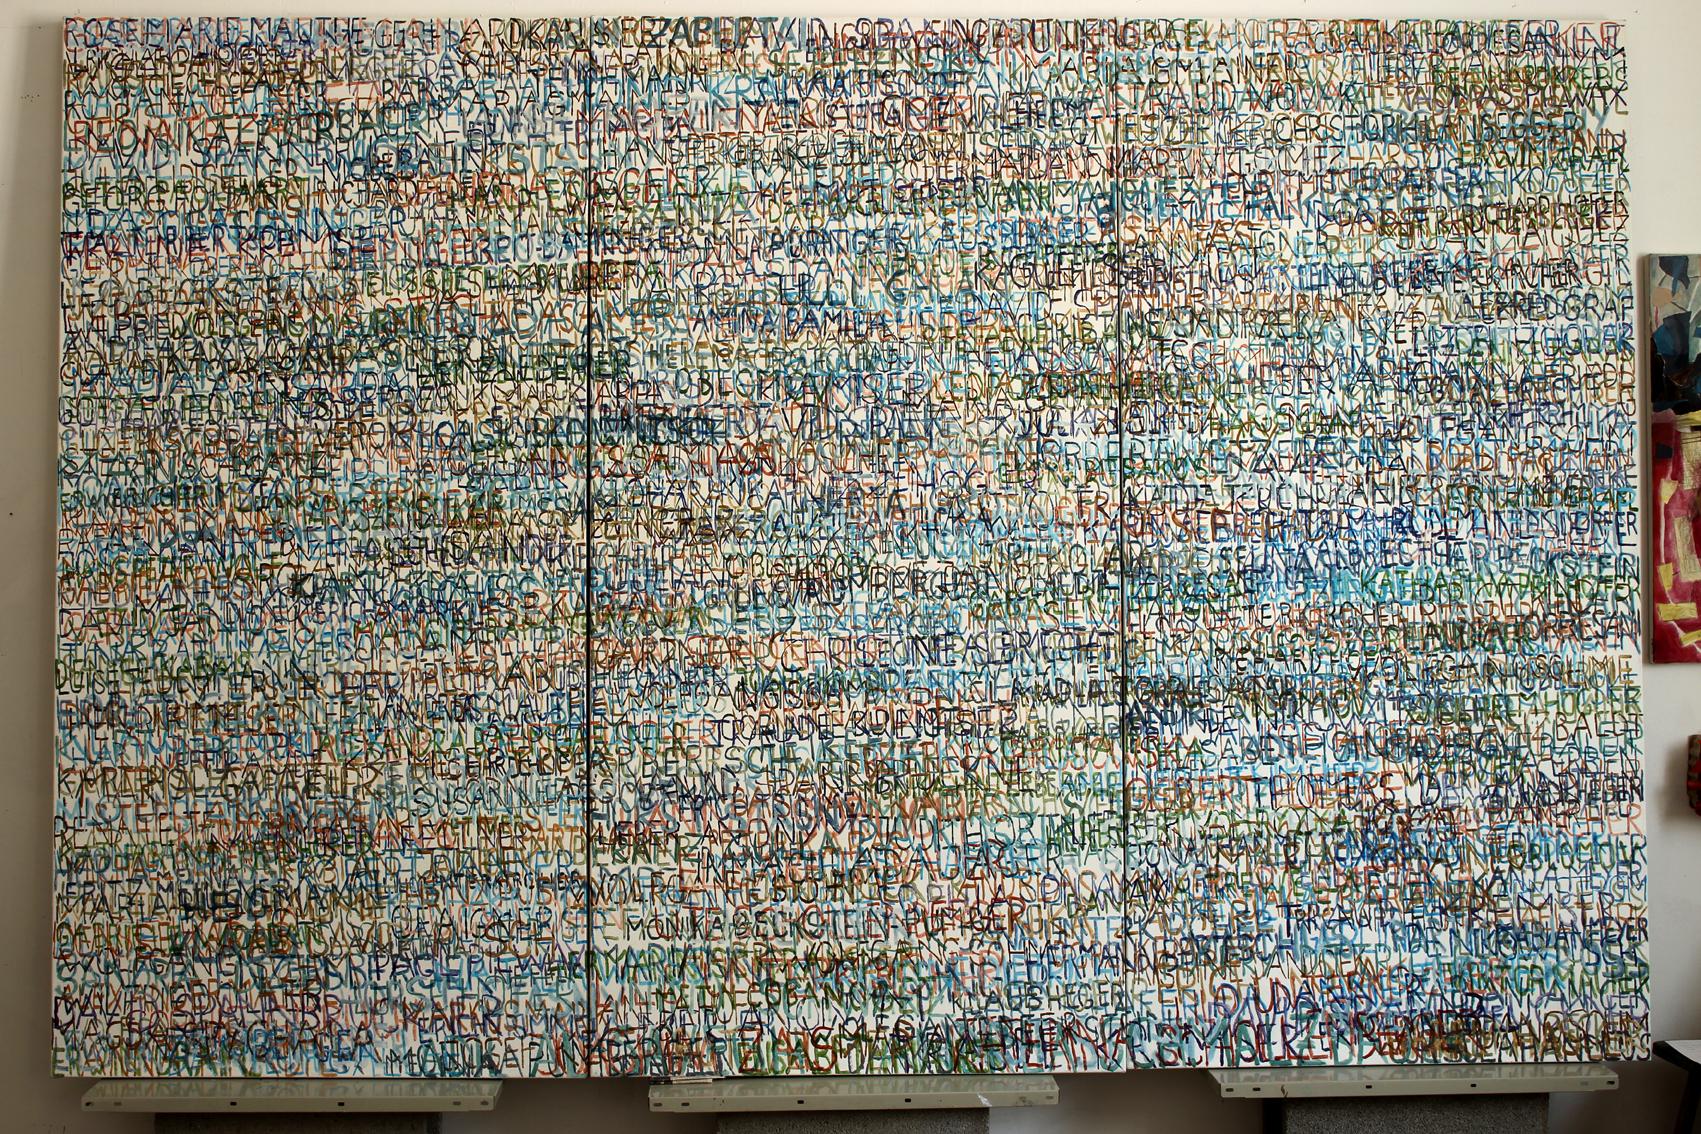 Eva Hradil, FARBaufWEISS, Zustandsbild mit 750 Namen